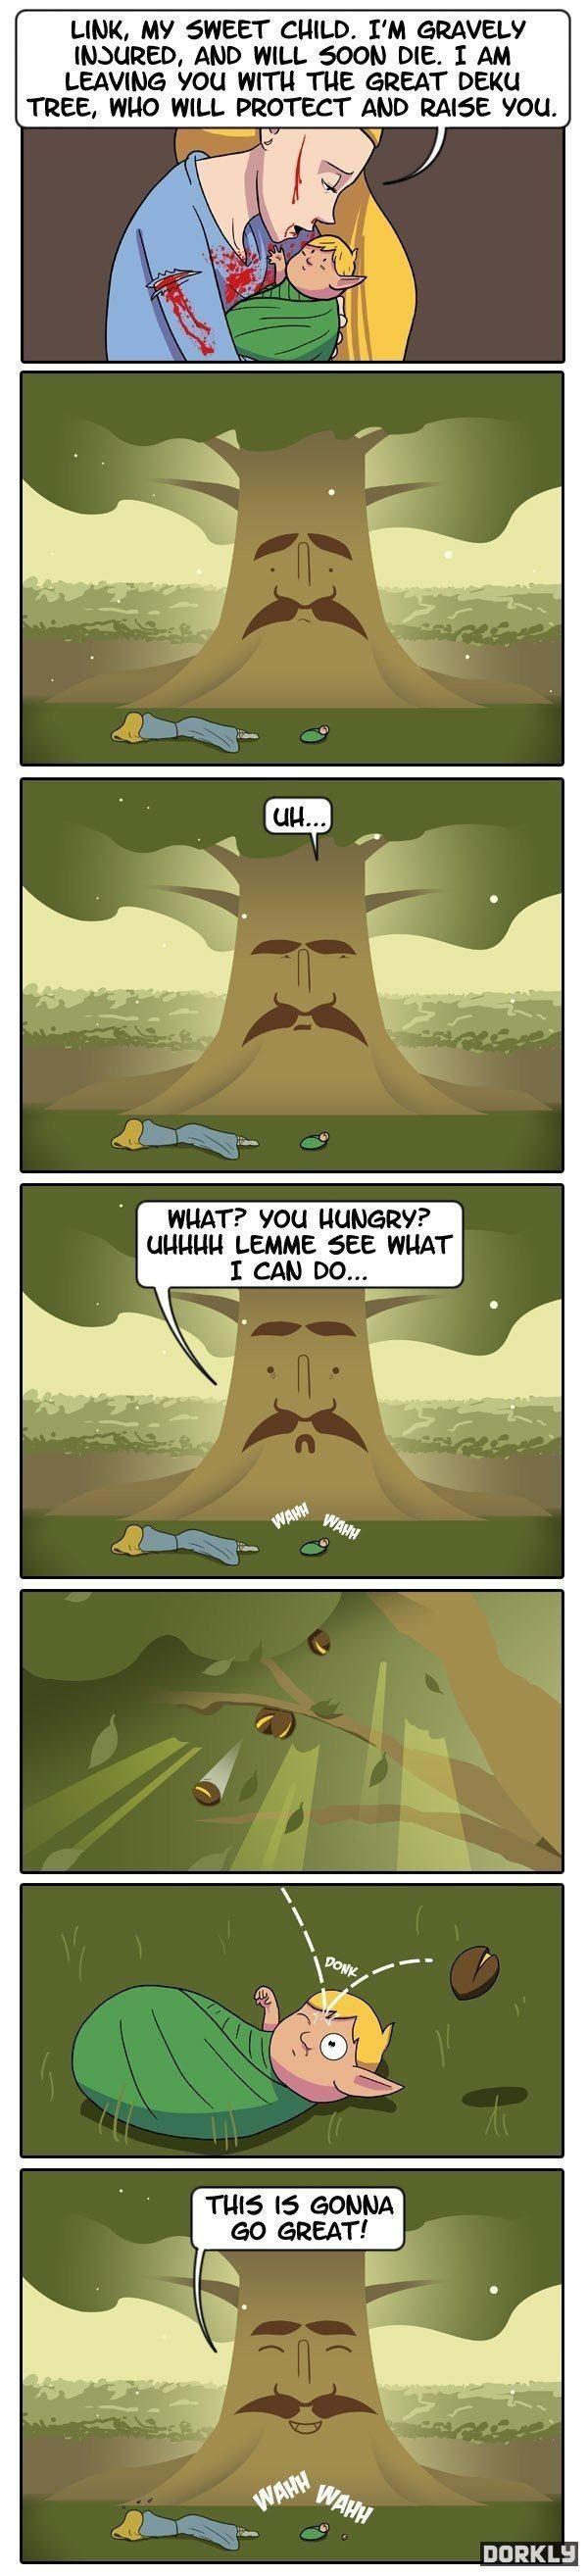 Deku Tree - meme